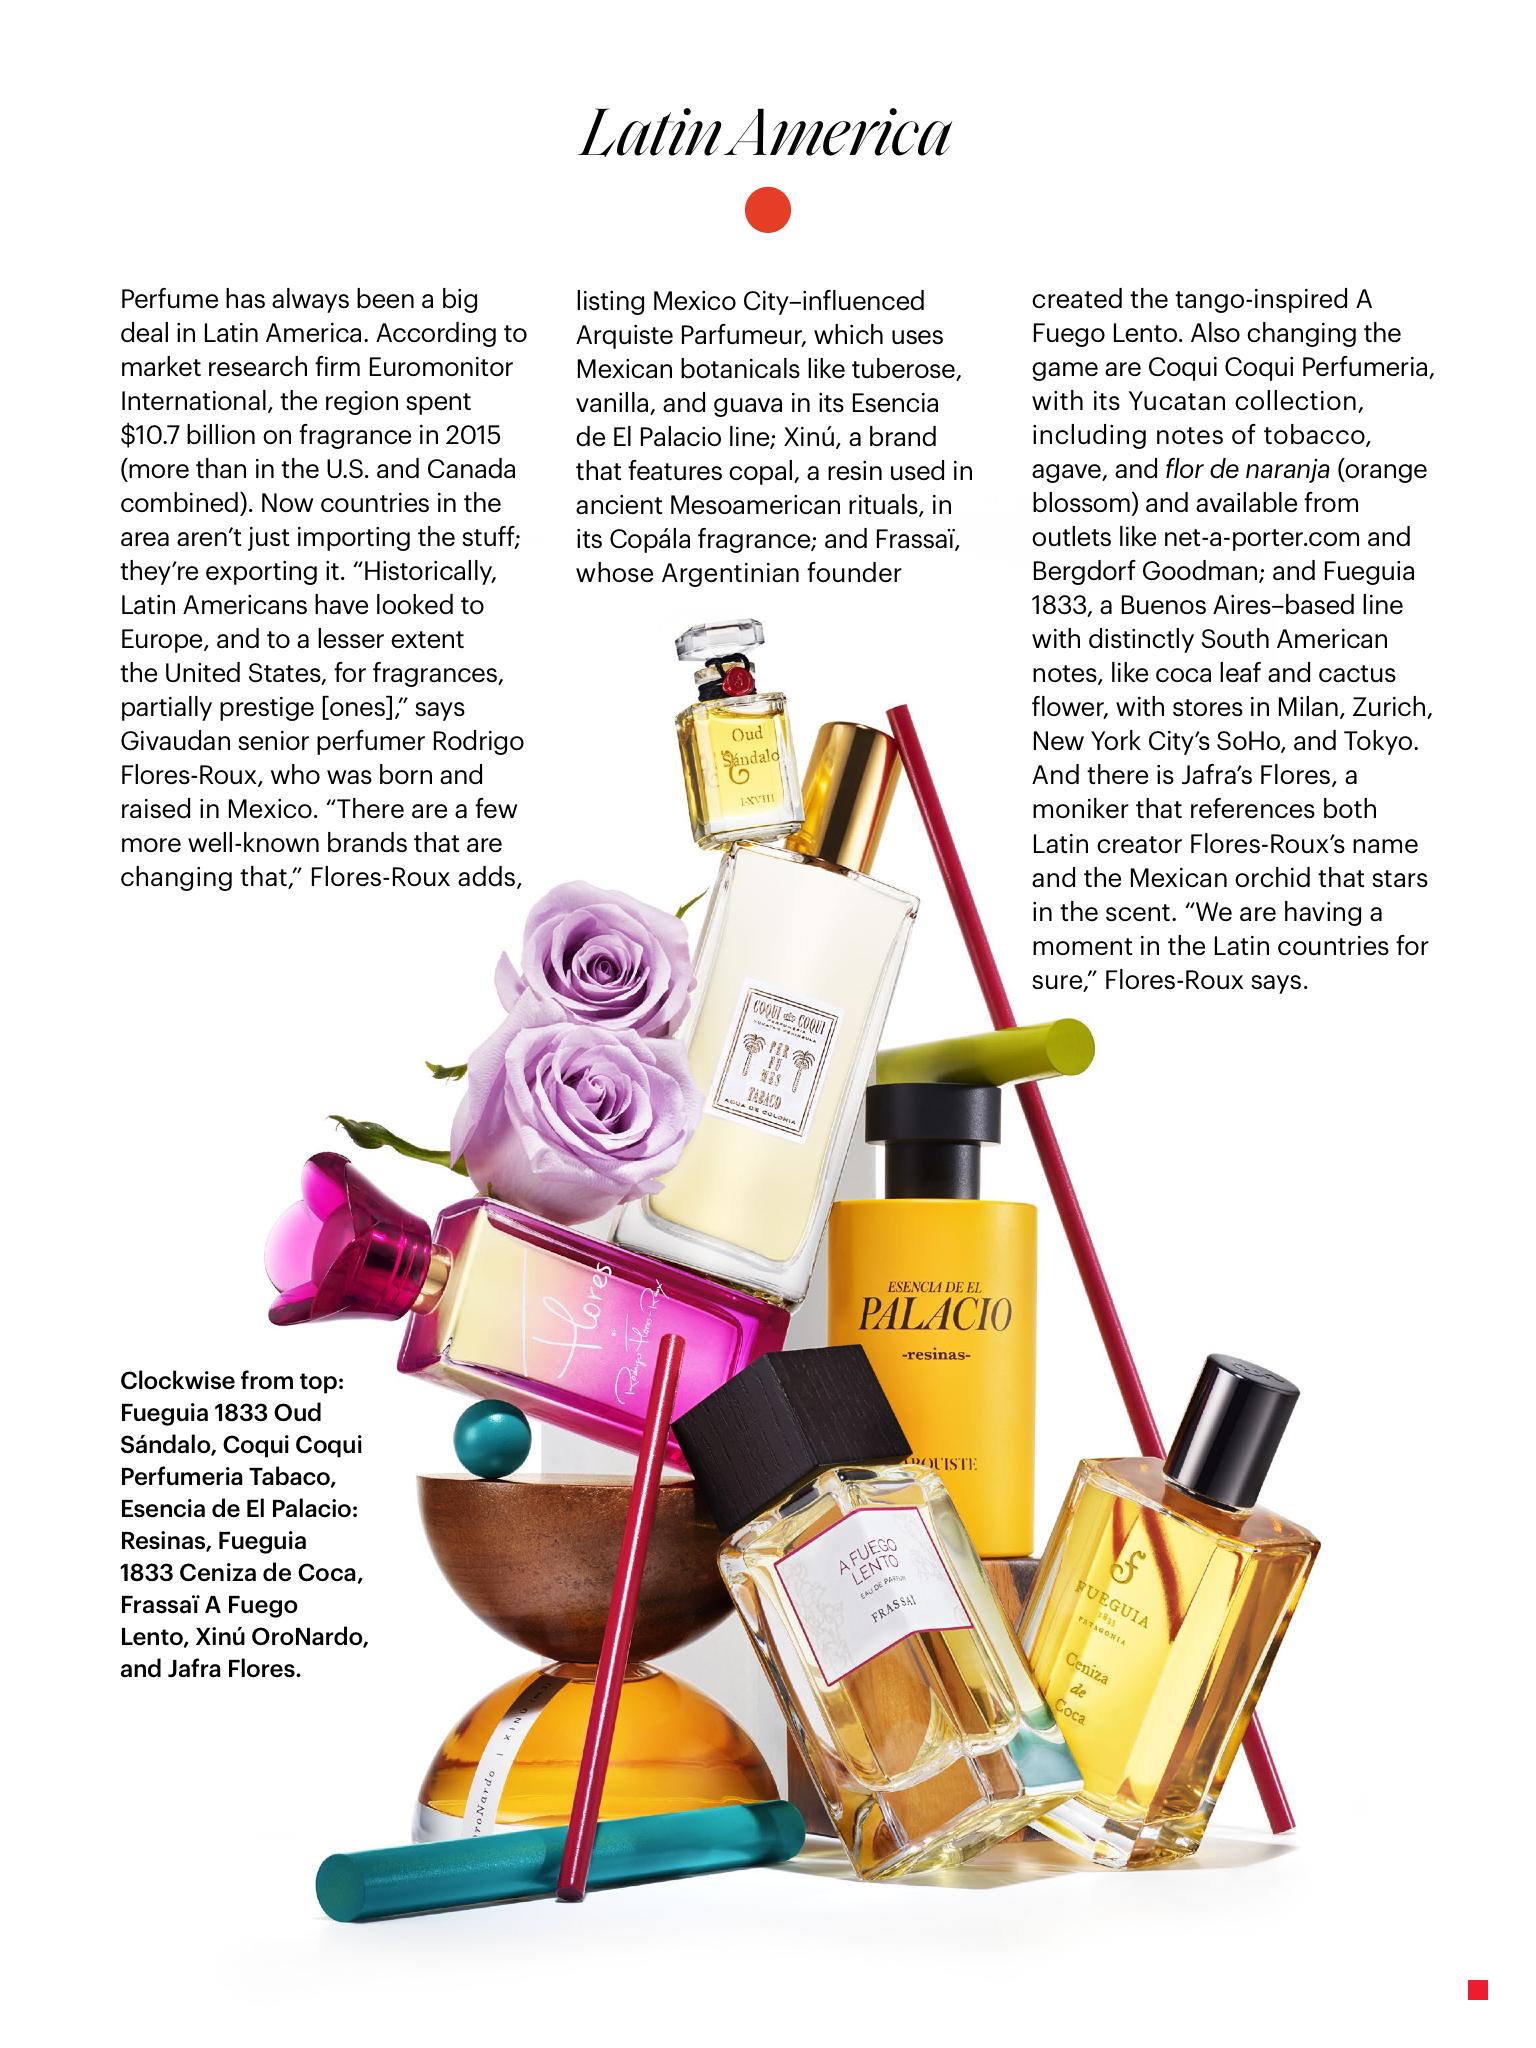 Allure magazine feature A Fuego Lento, FRASSAÏ Latin American scents